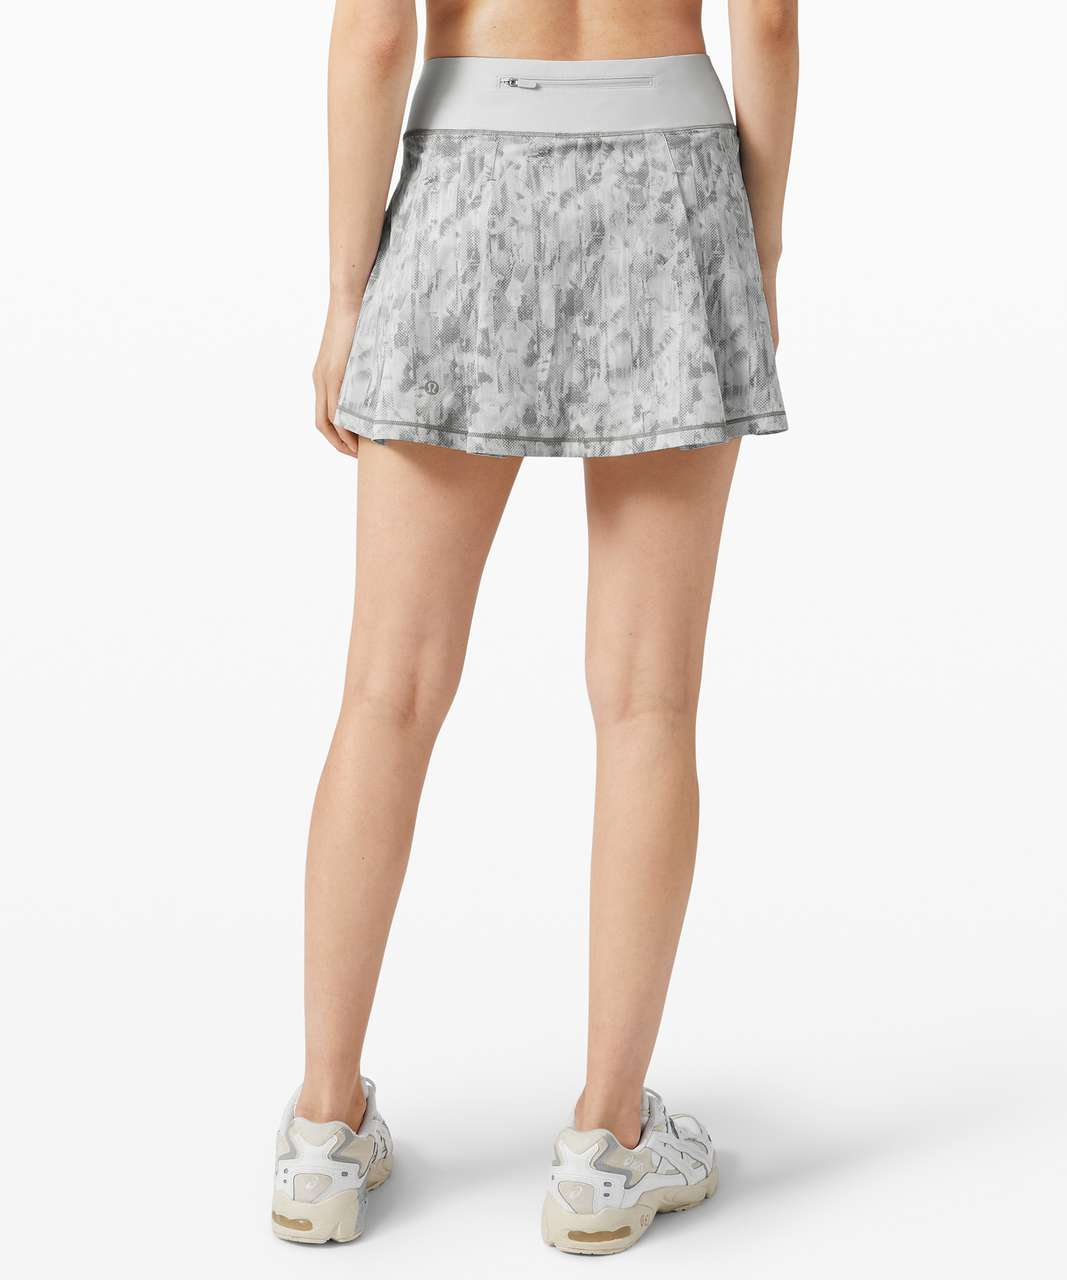 "Lululemon Pace Rival Skirt (Tall) *No Panels 15"" - City Breeze Alpine White Multi / Alpine White"